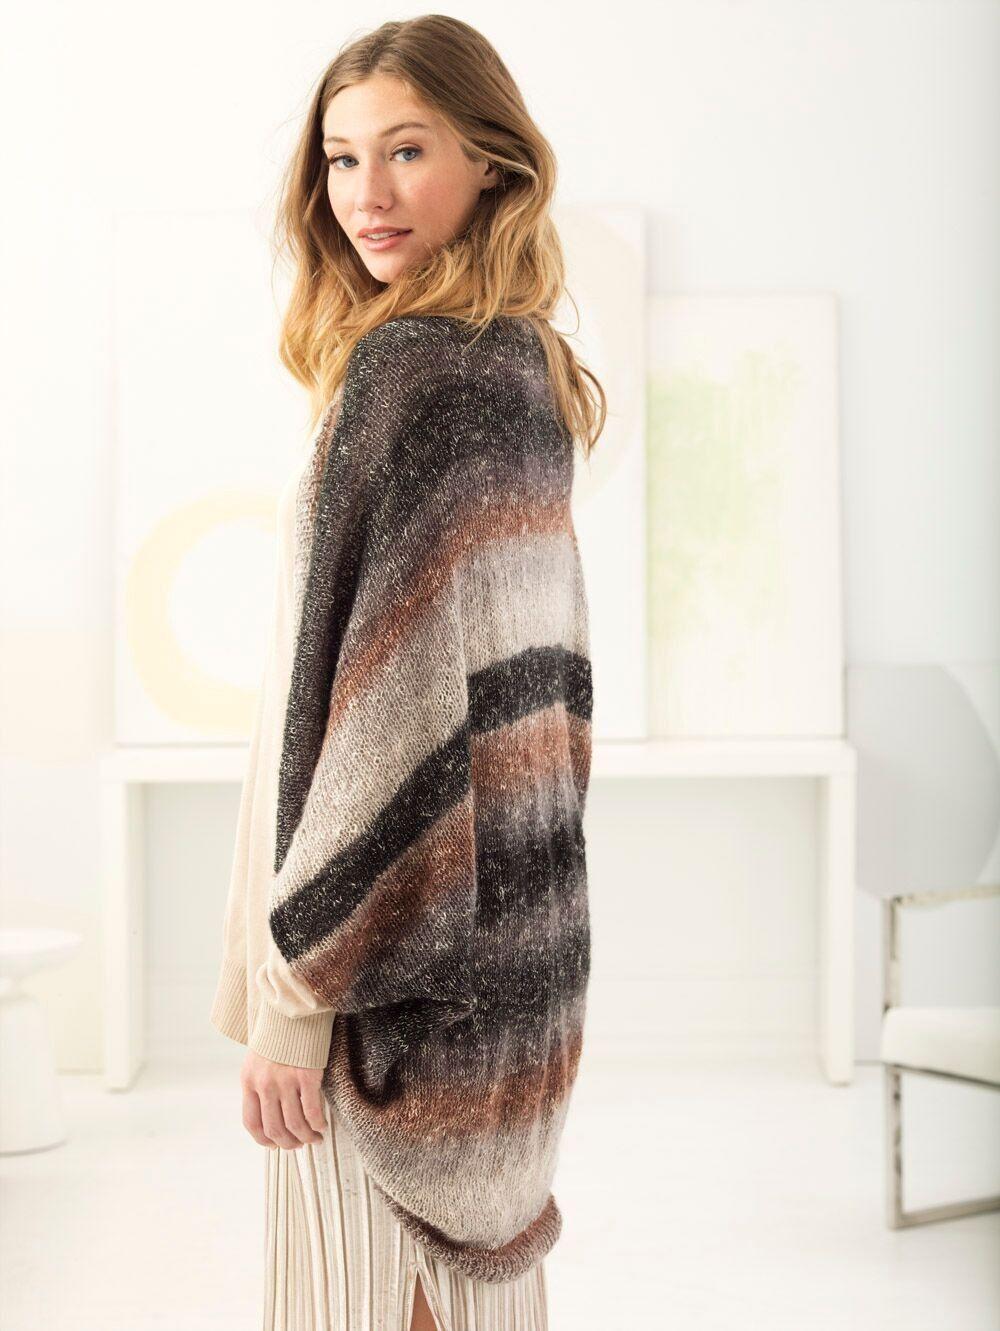 8 Neutral Knits To Make This Spring | Yarns, Shrug knitting pattern ...